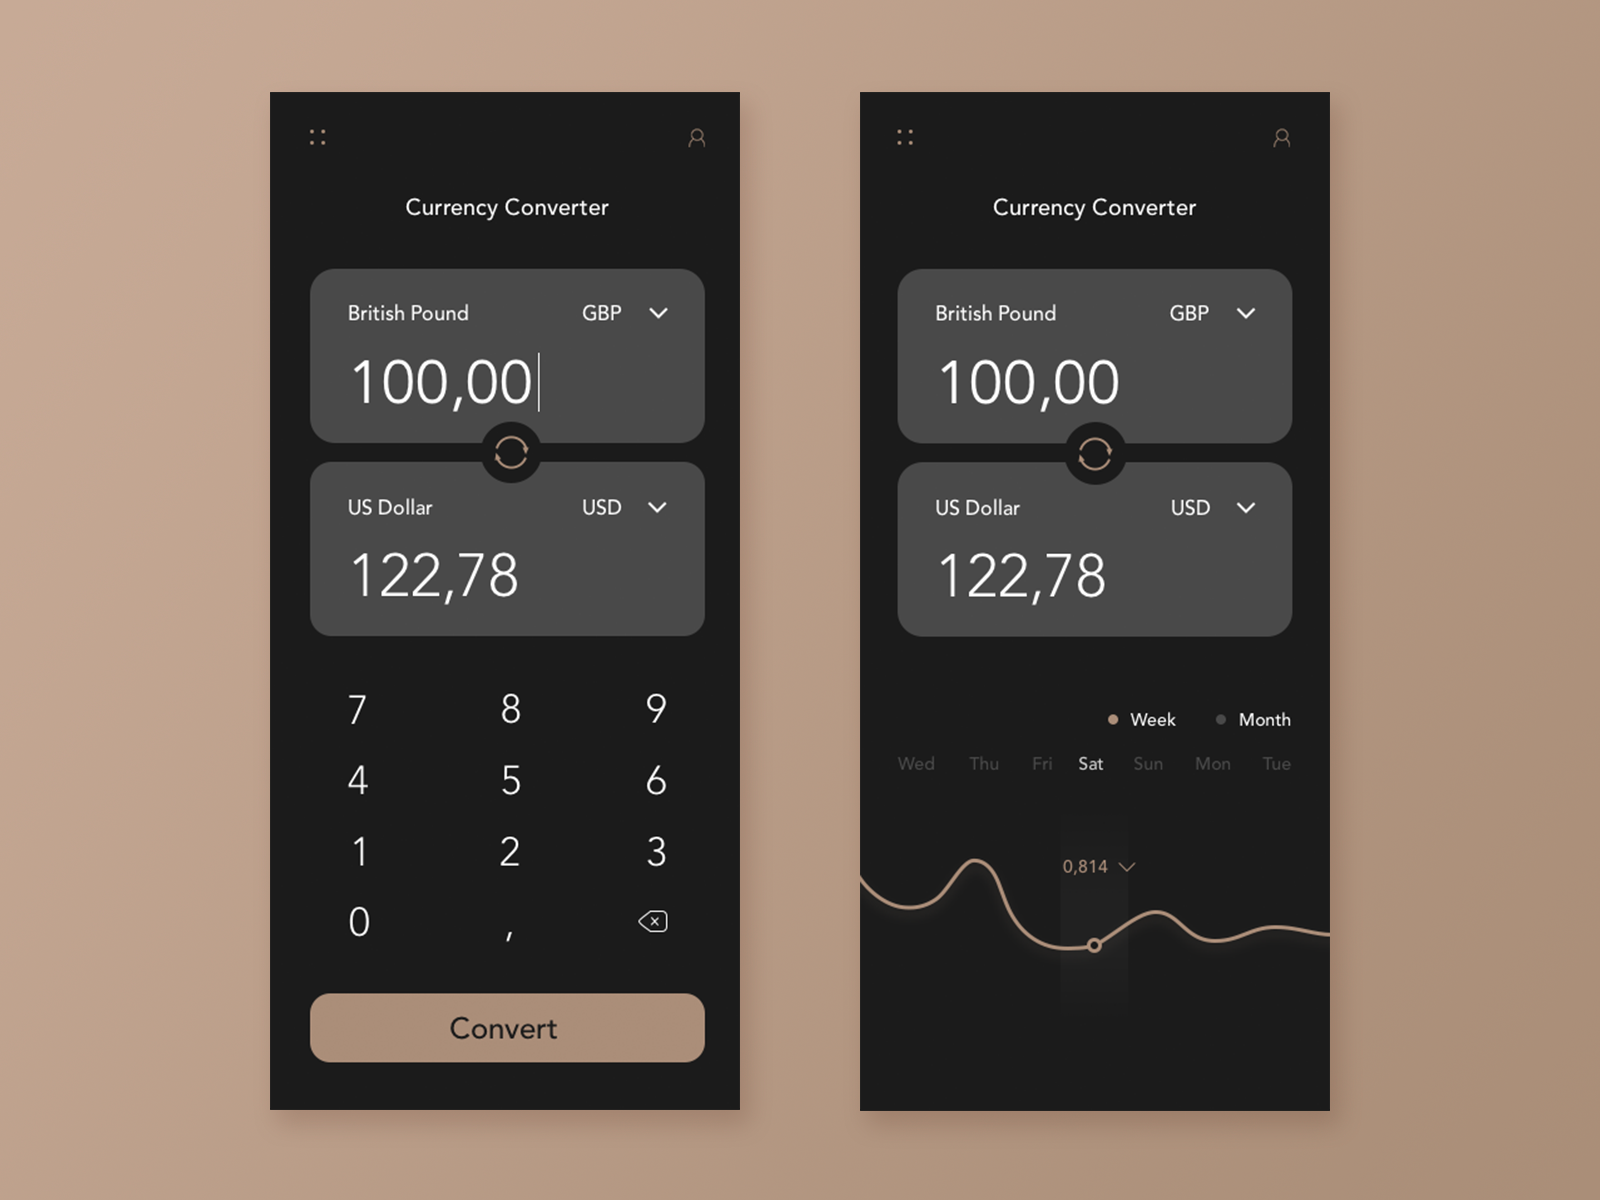 Currency Converter App Converter App Currency Converter Converter